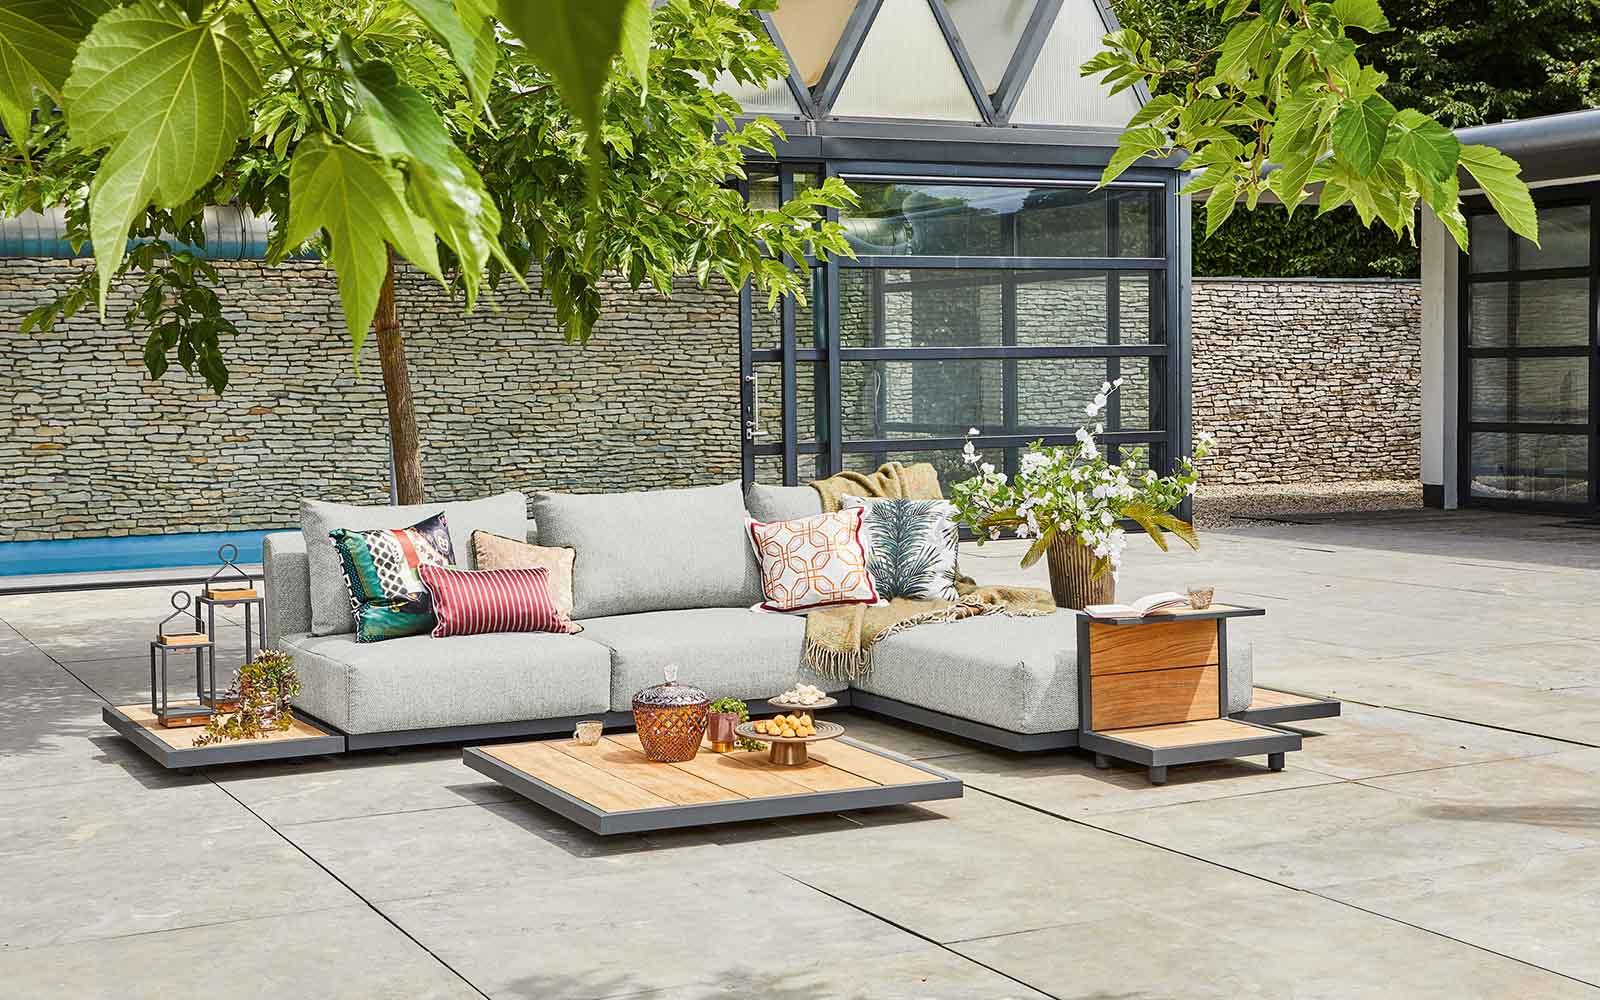 loungeset, tuinmeubelen, suns tuinmeubelen, the art of living